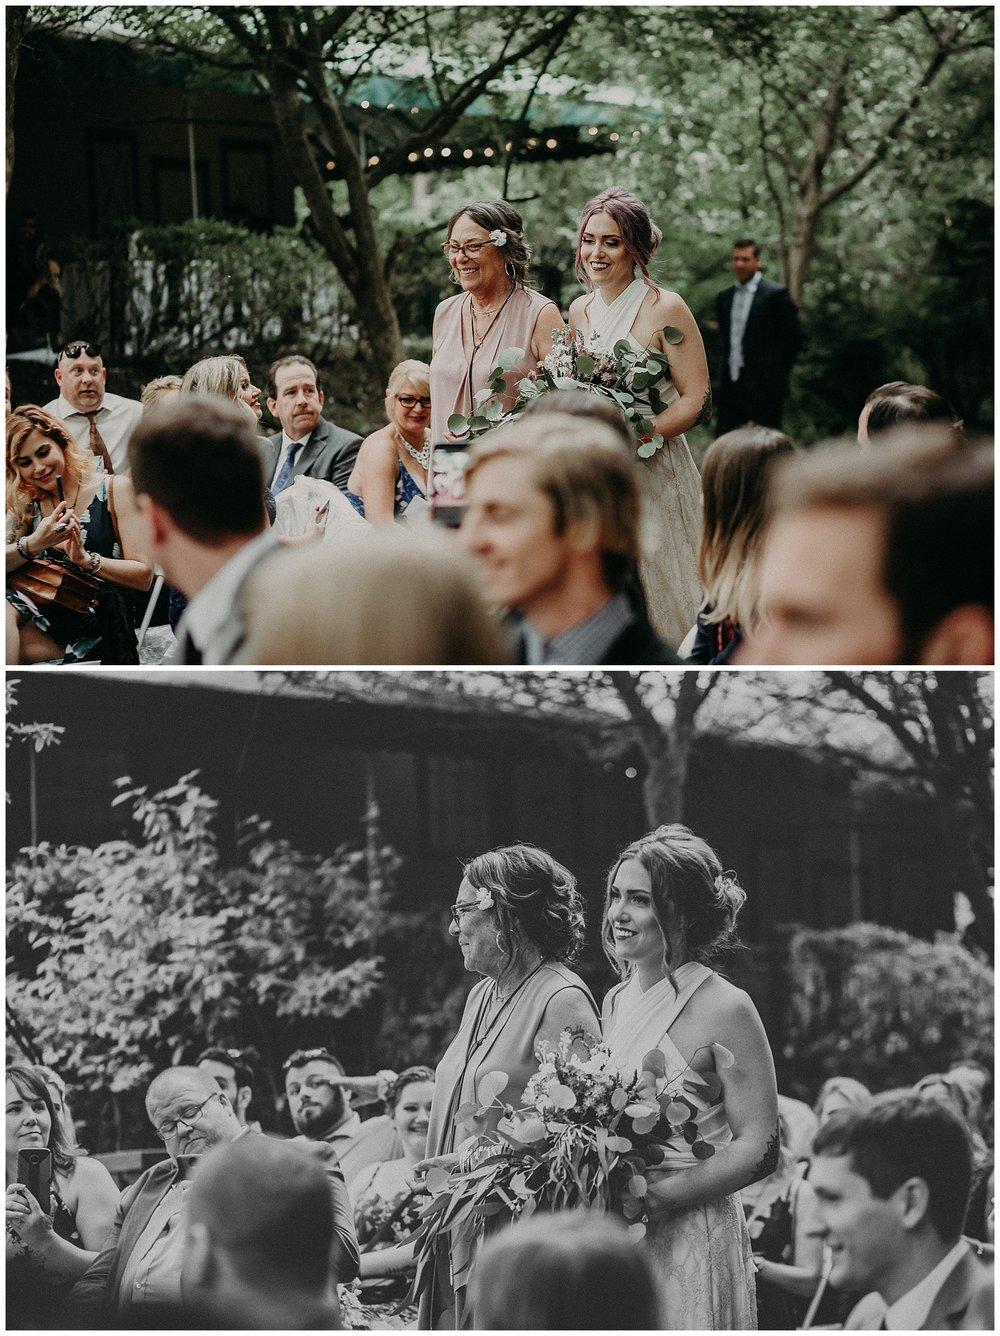 Outdoor Summer Boho Wedding at Ridgeland Manion in Downtown Philadelphia Pennsylvania_0093.jpg